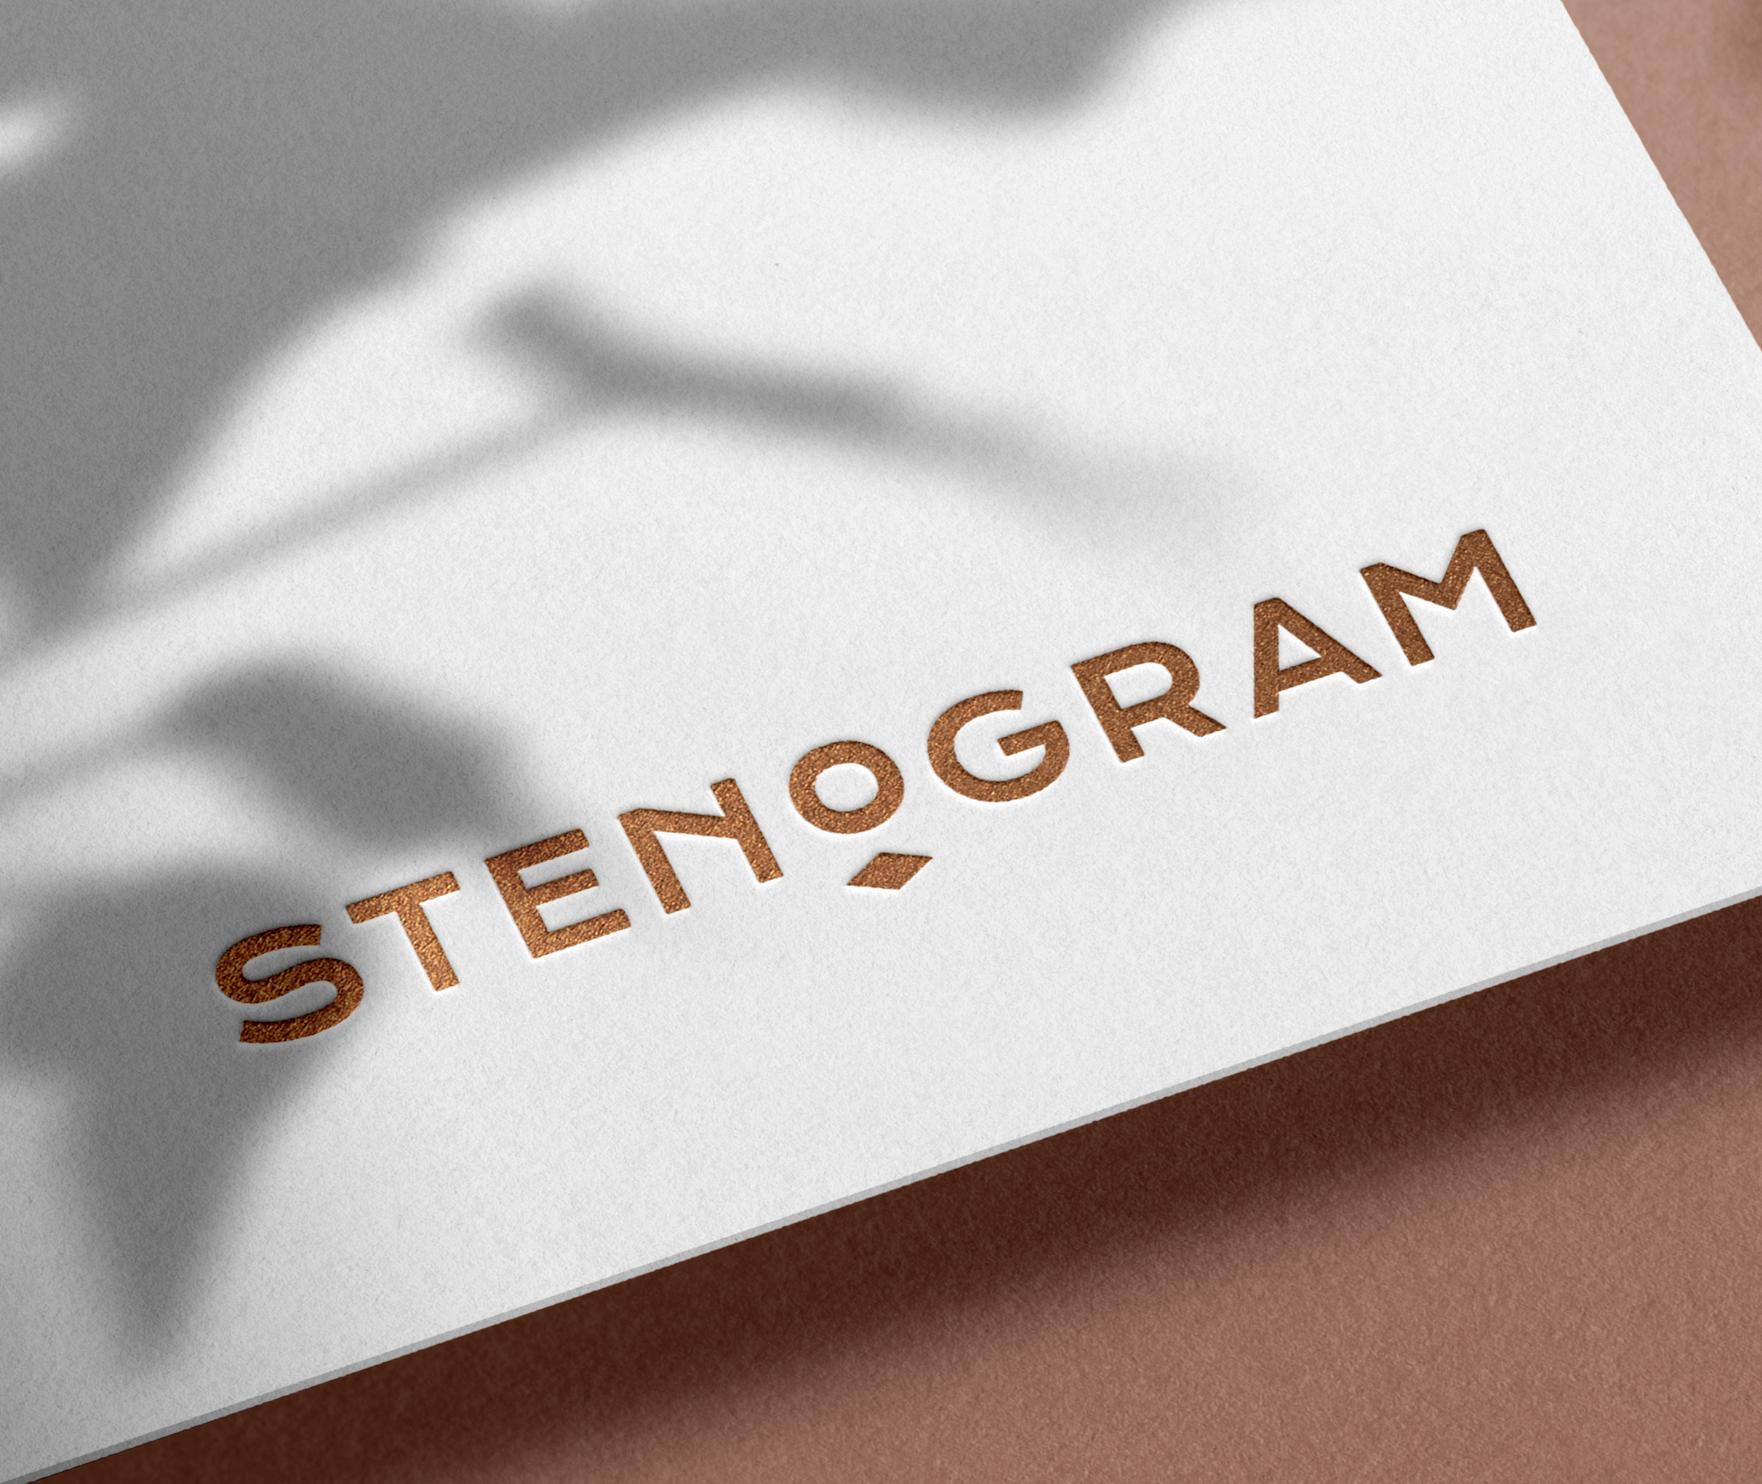 Stenogram